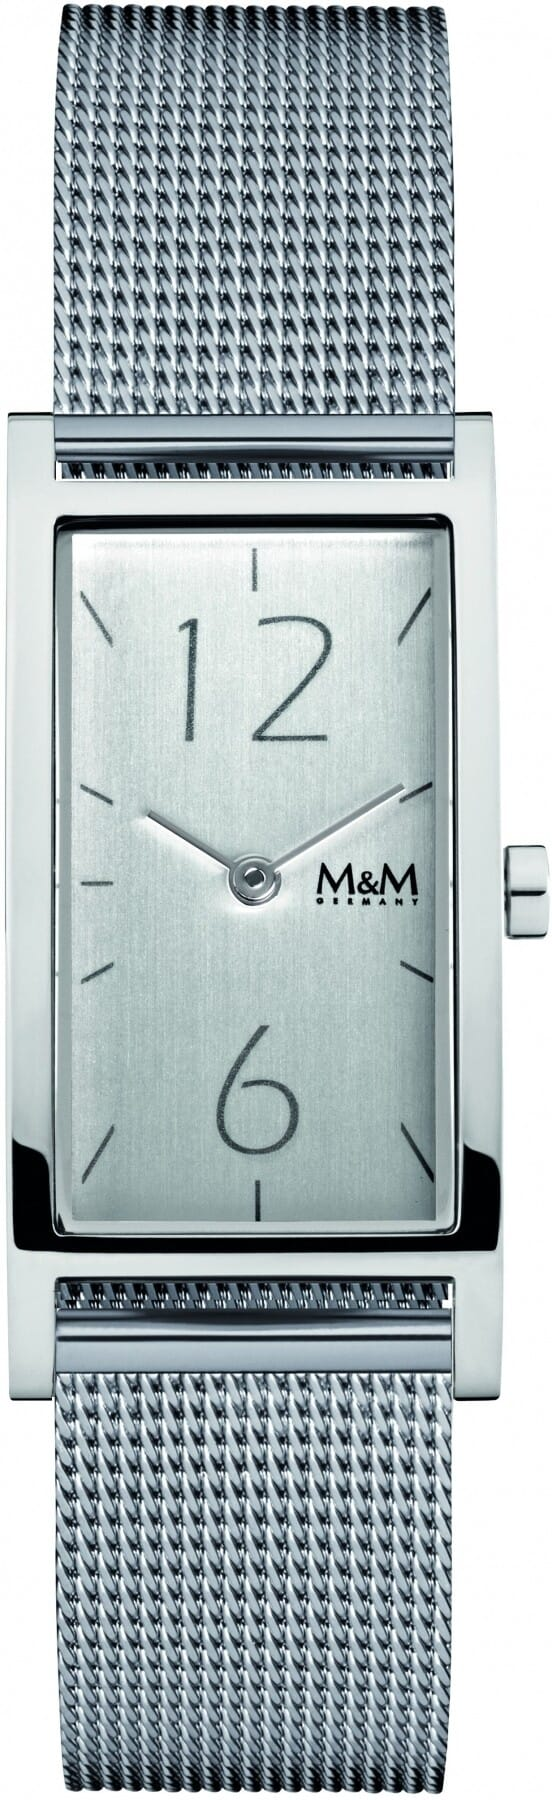 MM Germany M11918-143